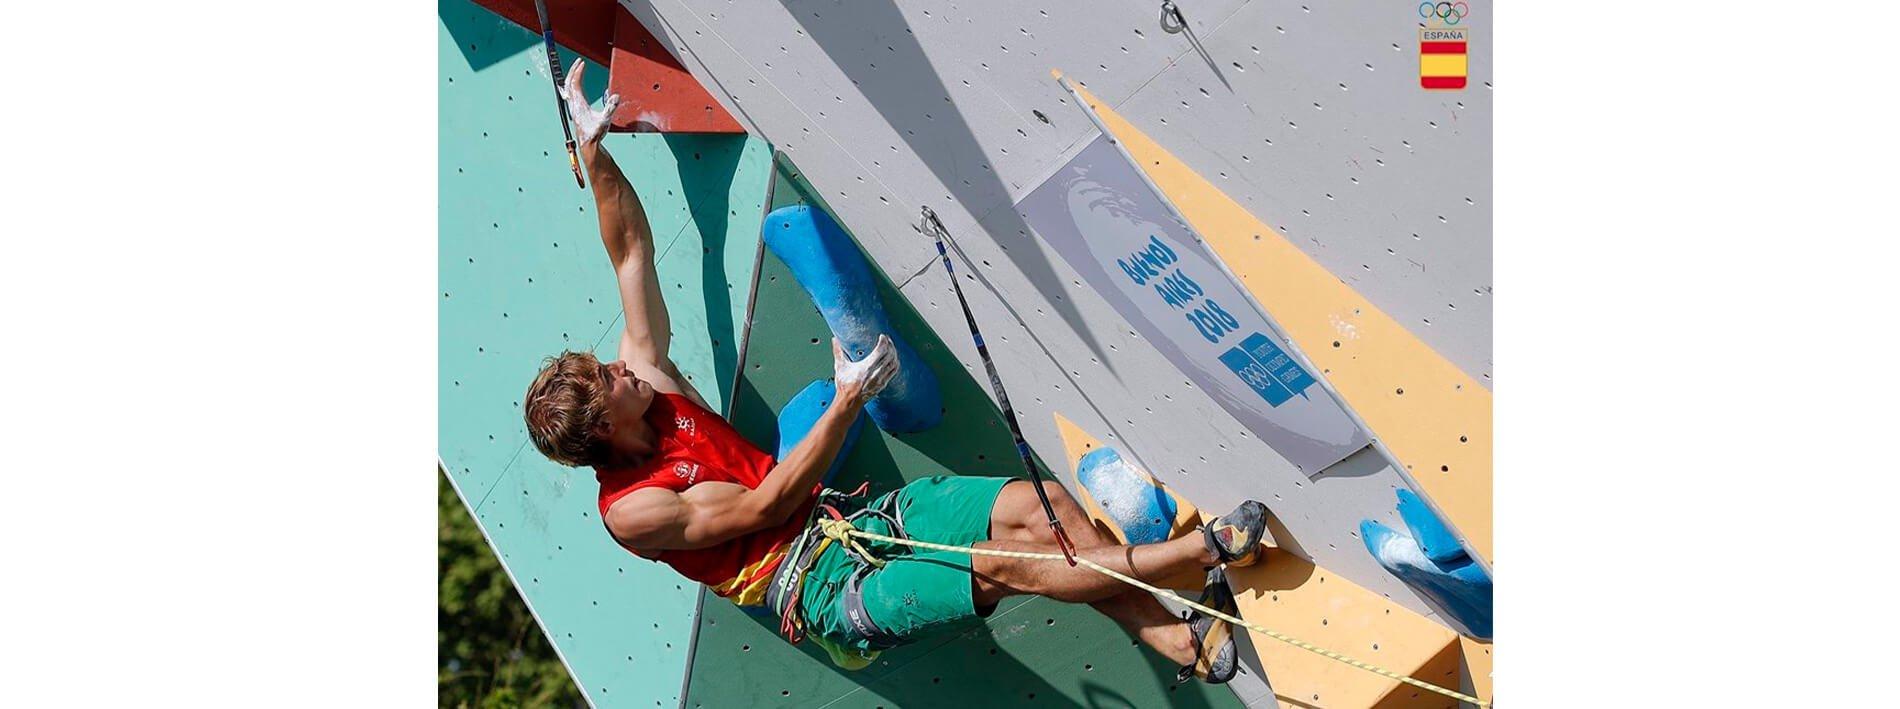 Escalada no olimpica img2